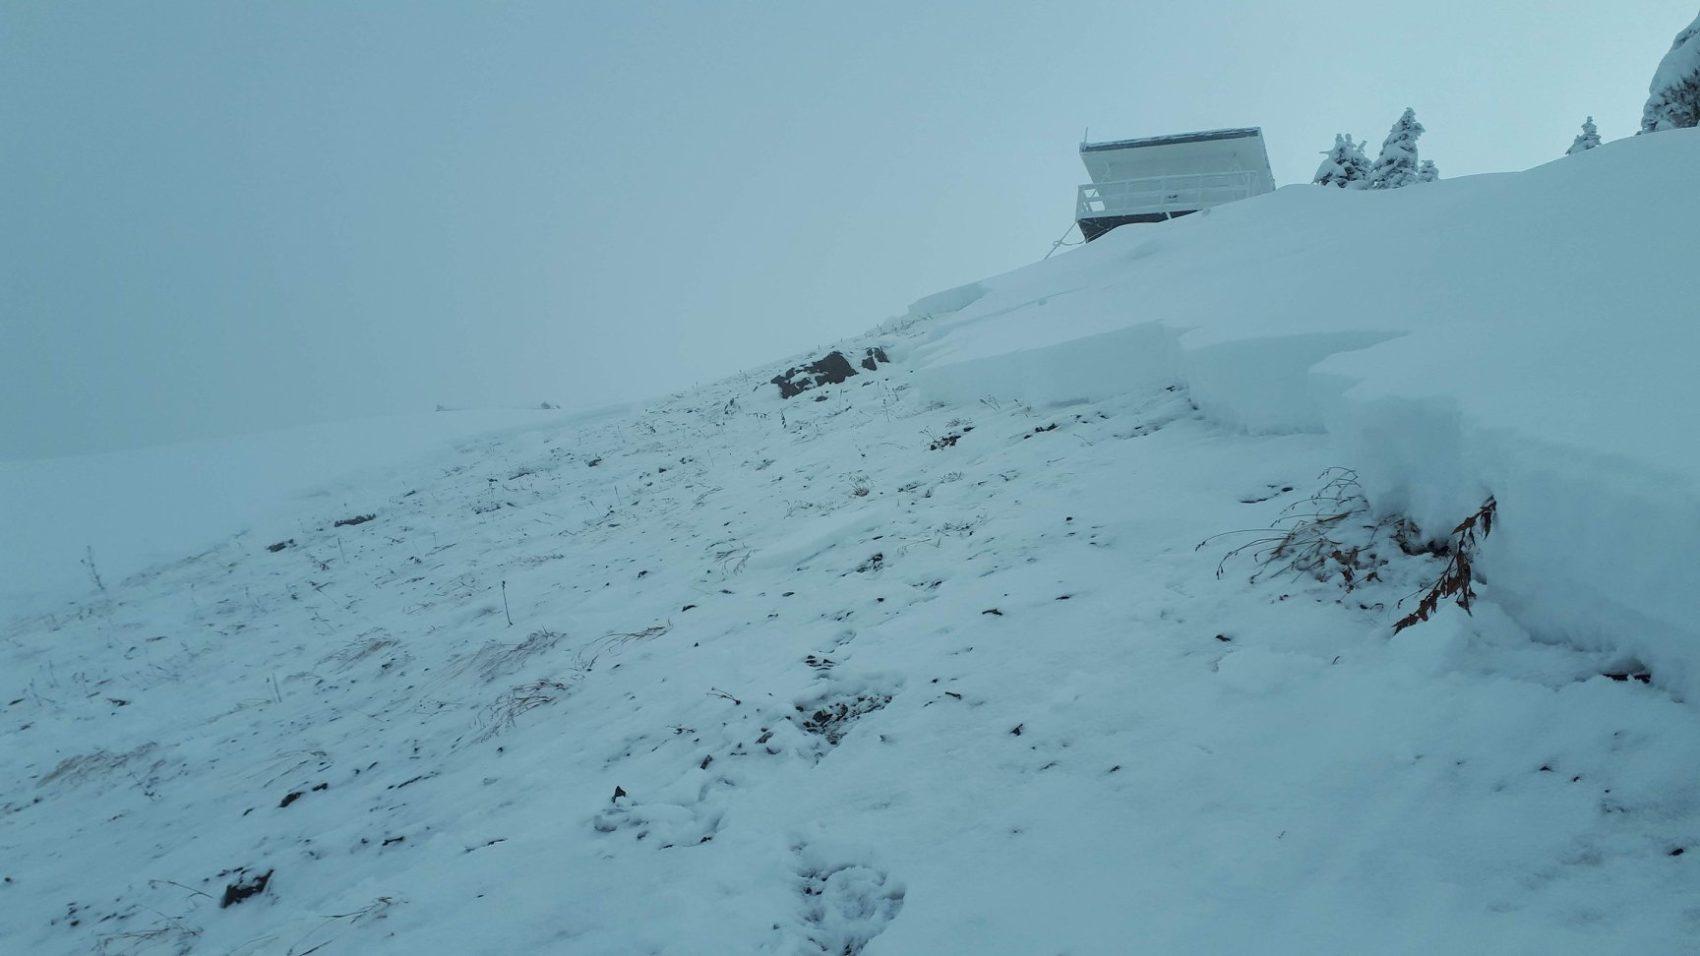 avalanche, canada, bc, Idaho peak, skier triggered